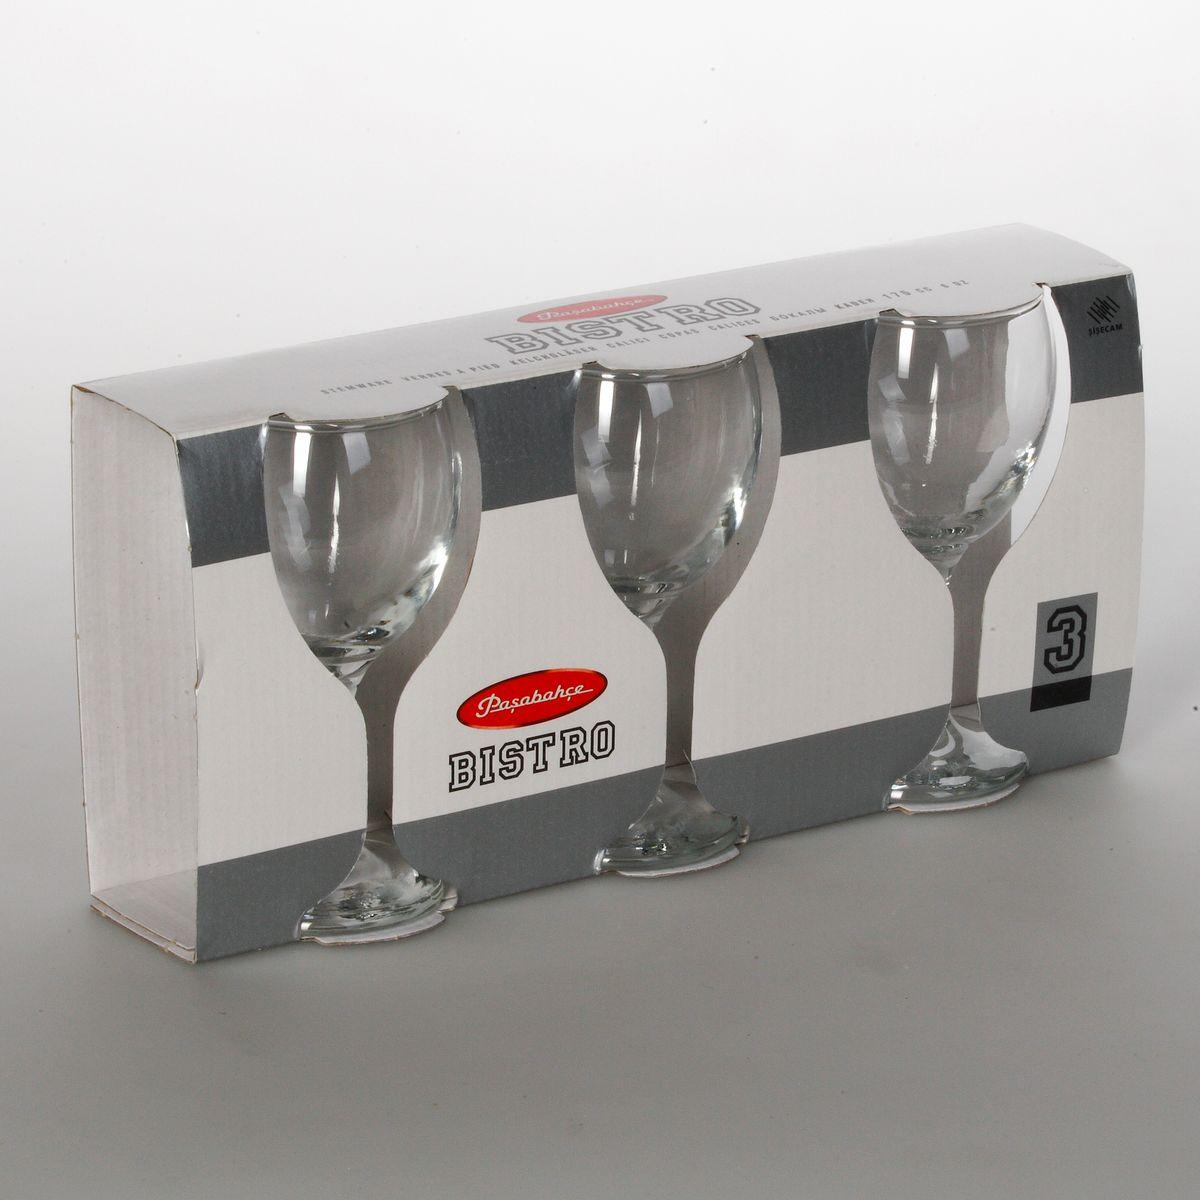 "Набор бокалов для белого вина Pasabahce ""Bistro"", 175 мл, 3 шт"